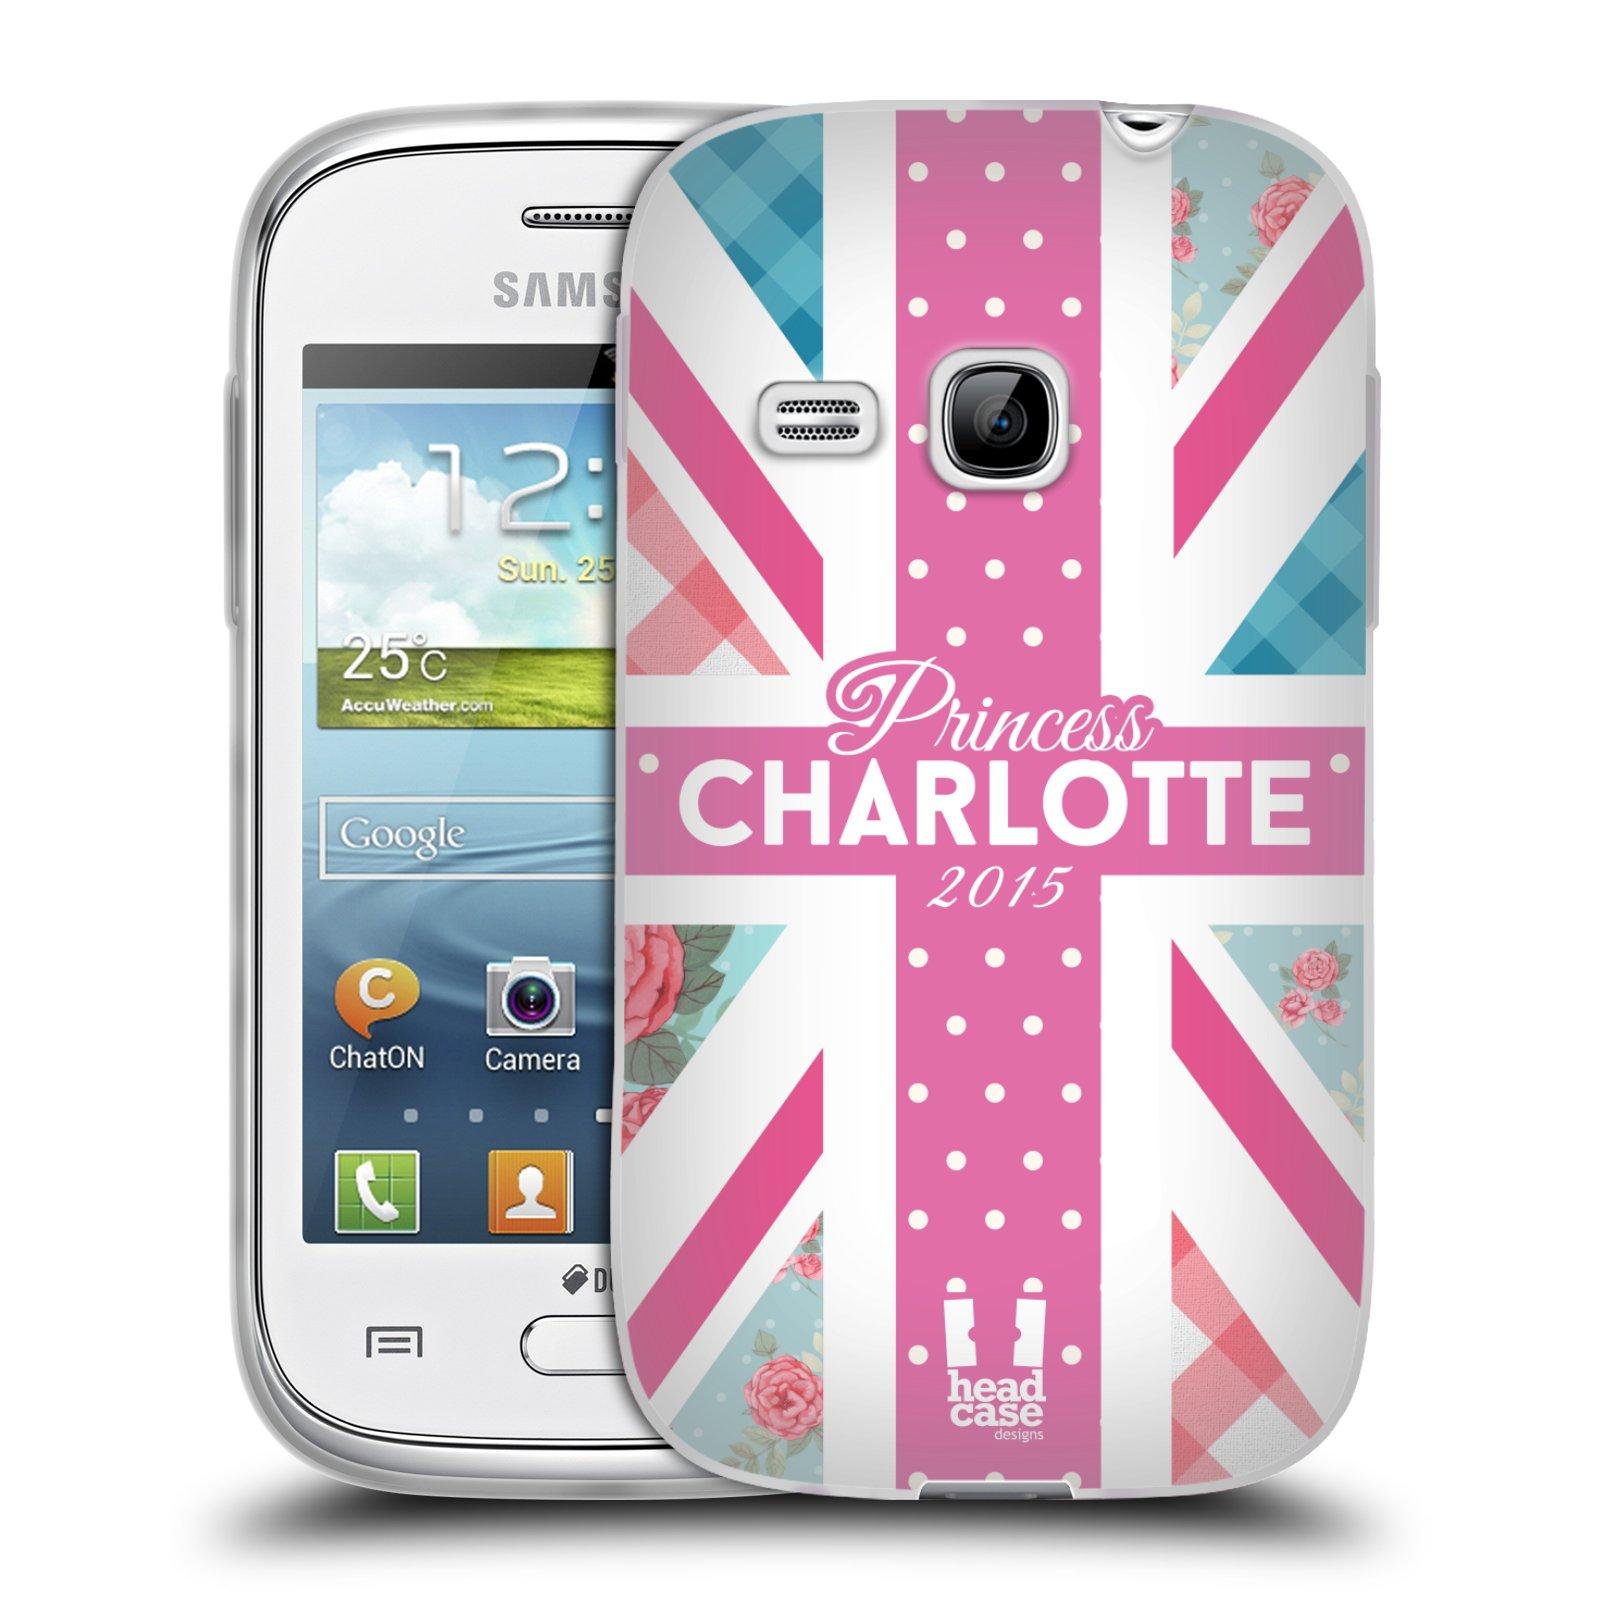 Silikonové pouzdro na mobil Samsung Galaxy Young HEAD CASE PRINCEZNIČKA CHARLOTTE (Silikonový kryt či obal na mobilní telefon Samsung Galaxy Young GT-S6310)